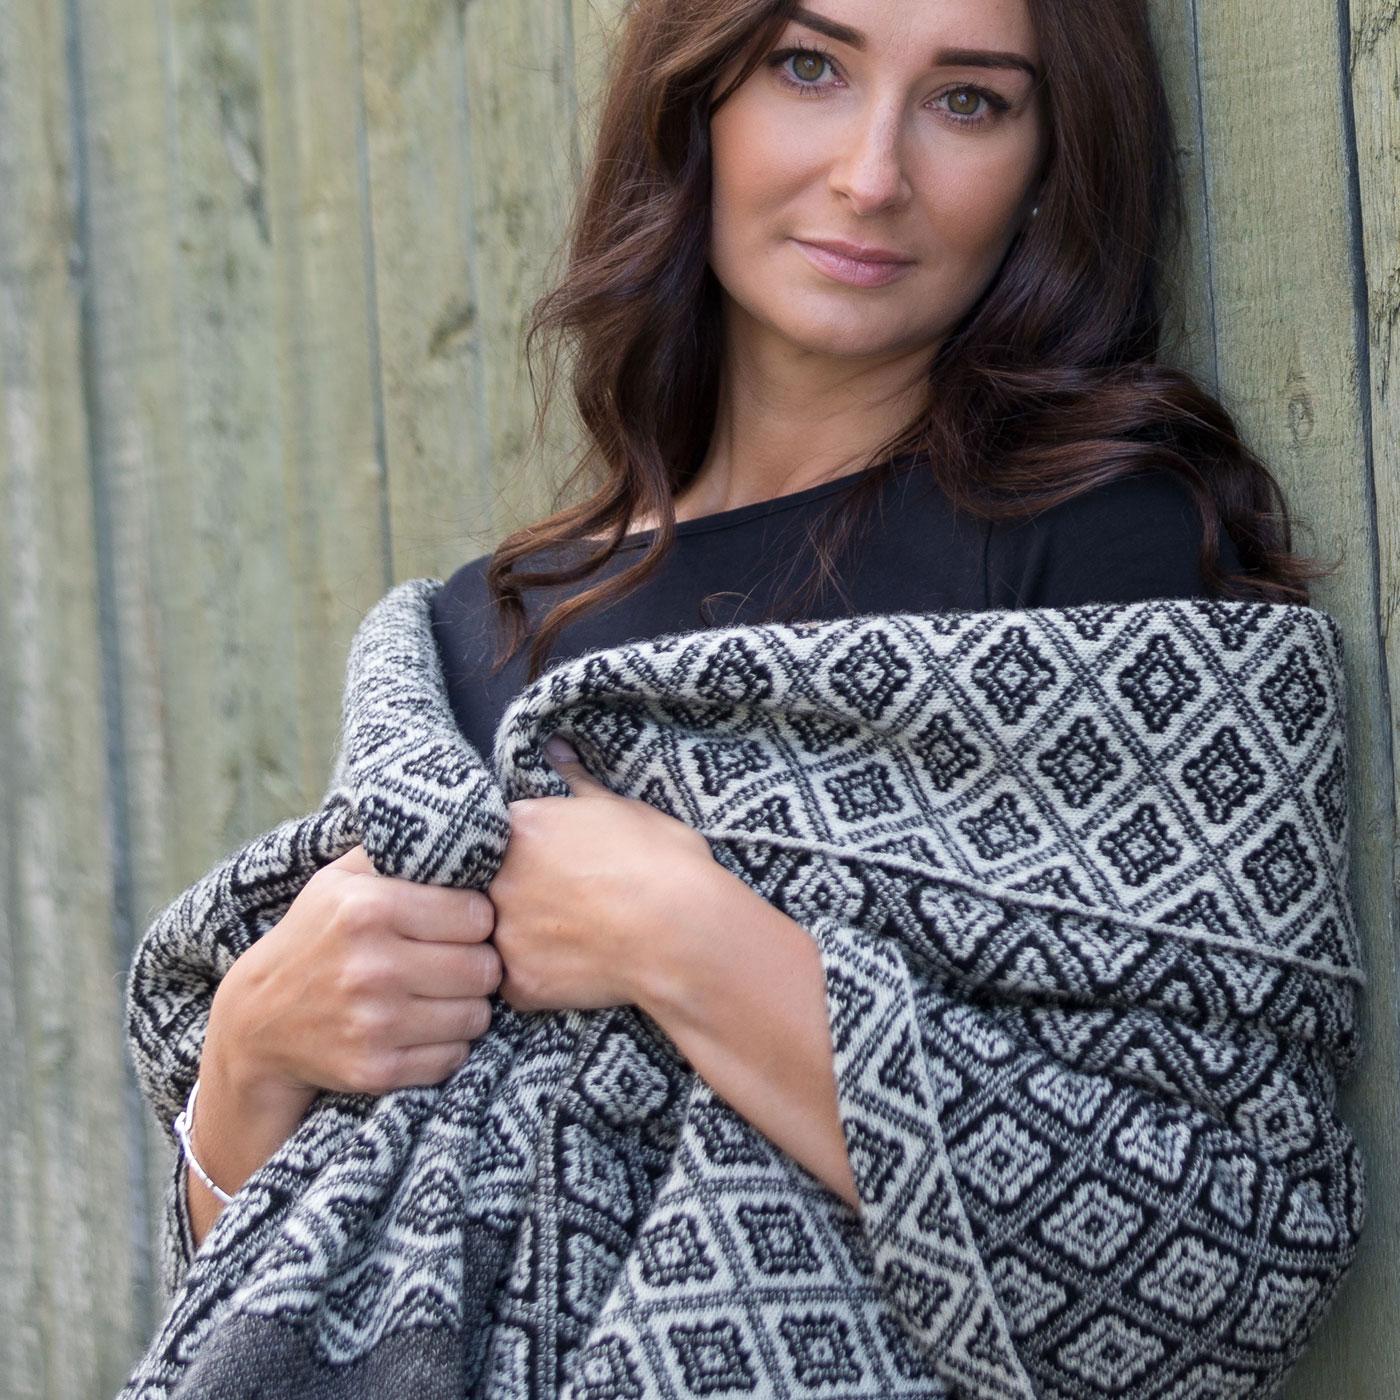 Shetland wool wrap in black & natural white